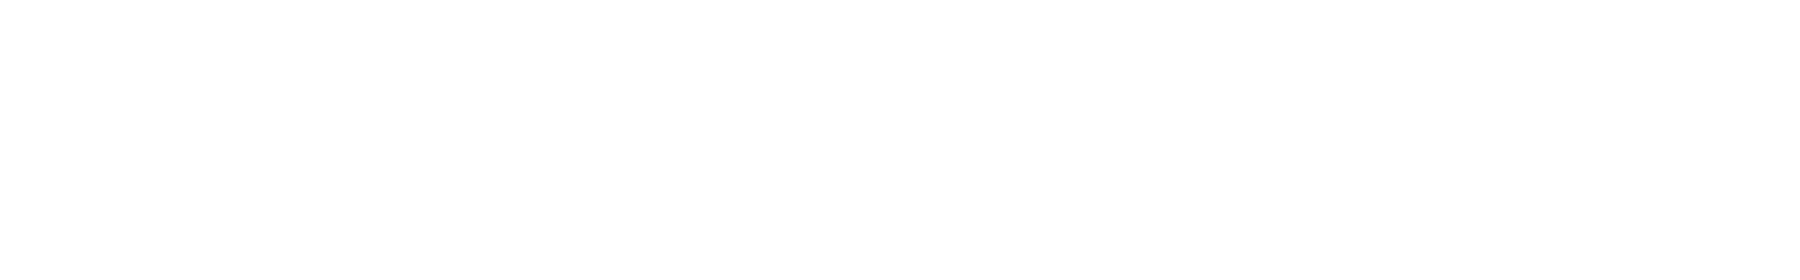 str fx b 04 xc